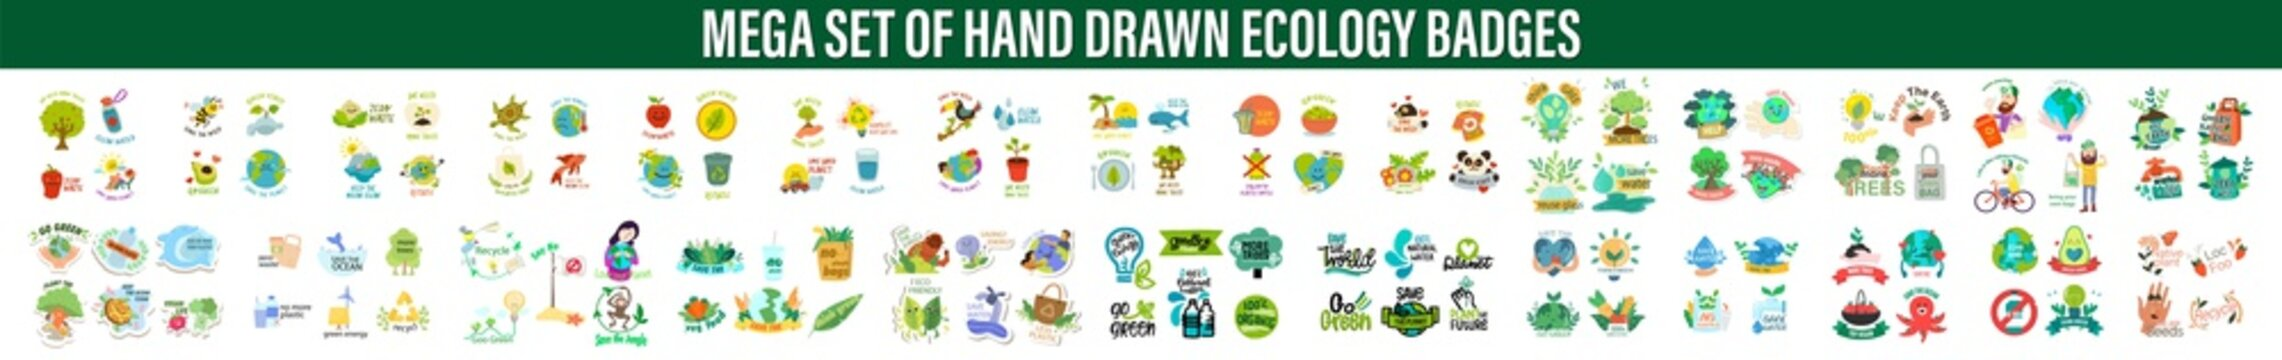 Set of vector handwritten ecology badges elements.  Vegan, fresh, bio, raw, eco, organic and healthy logos and icons. Bio, Ecology, Organic logos and icons, labels, tags. Hand drawn bio healthy food